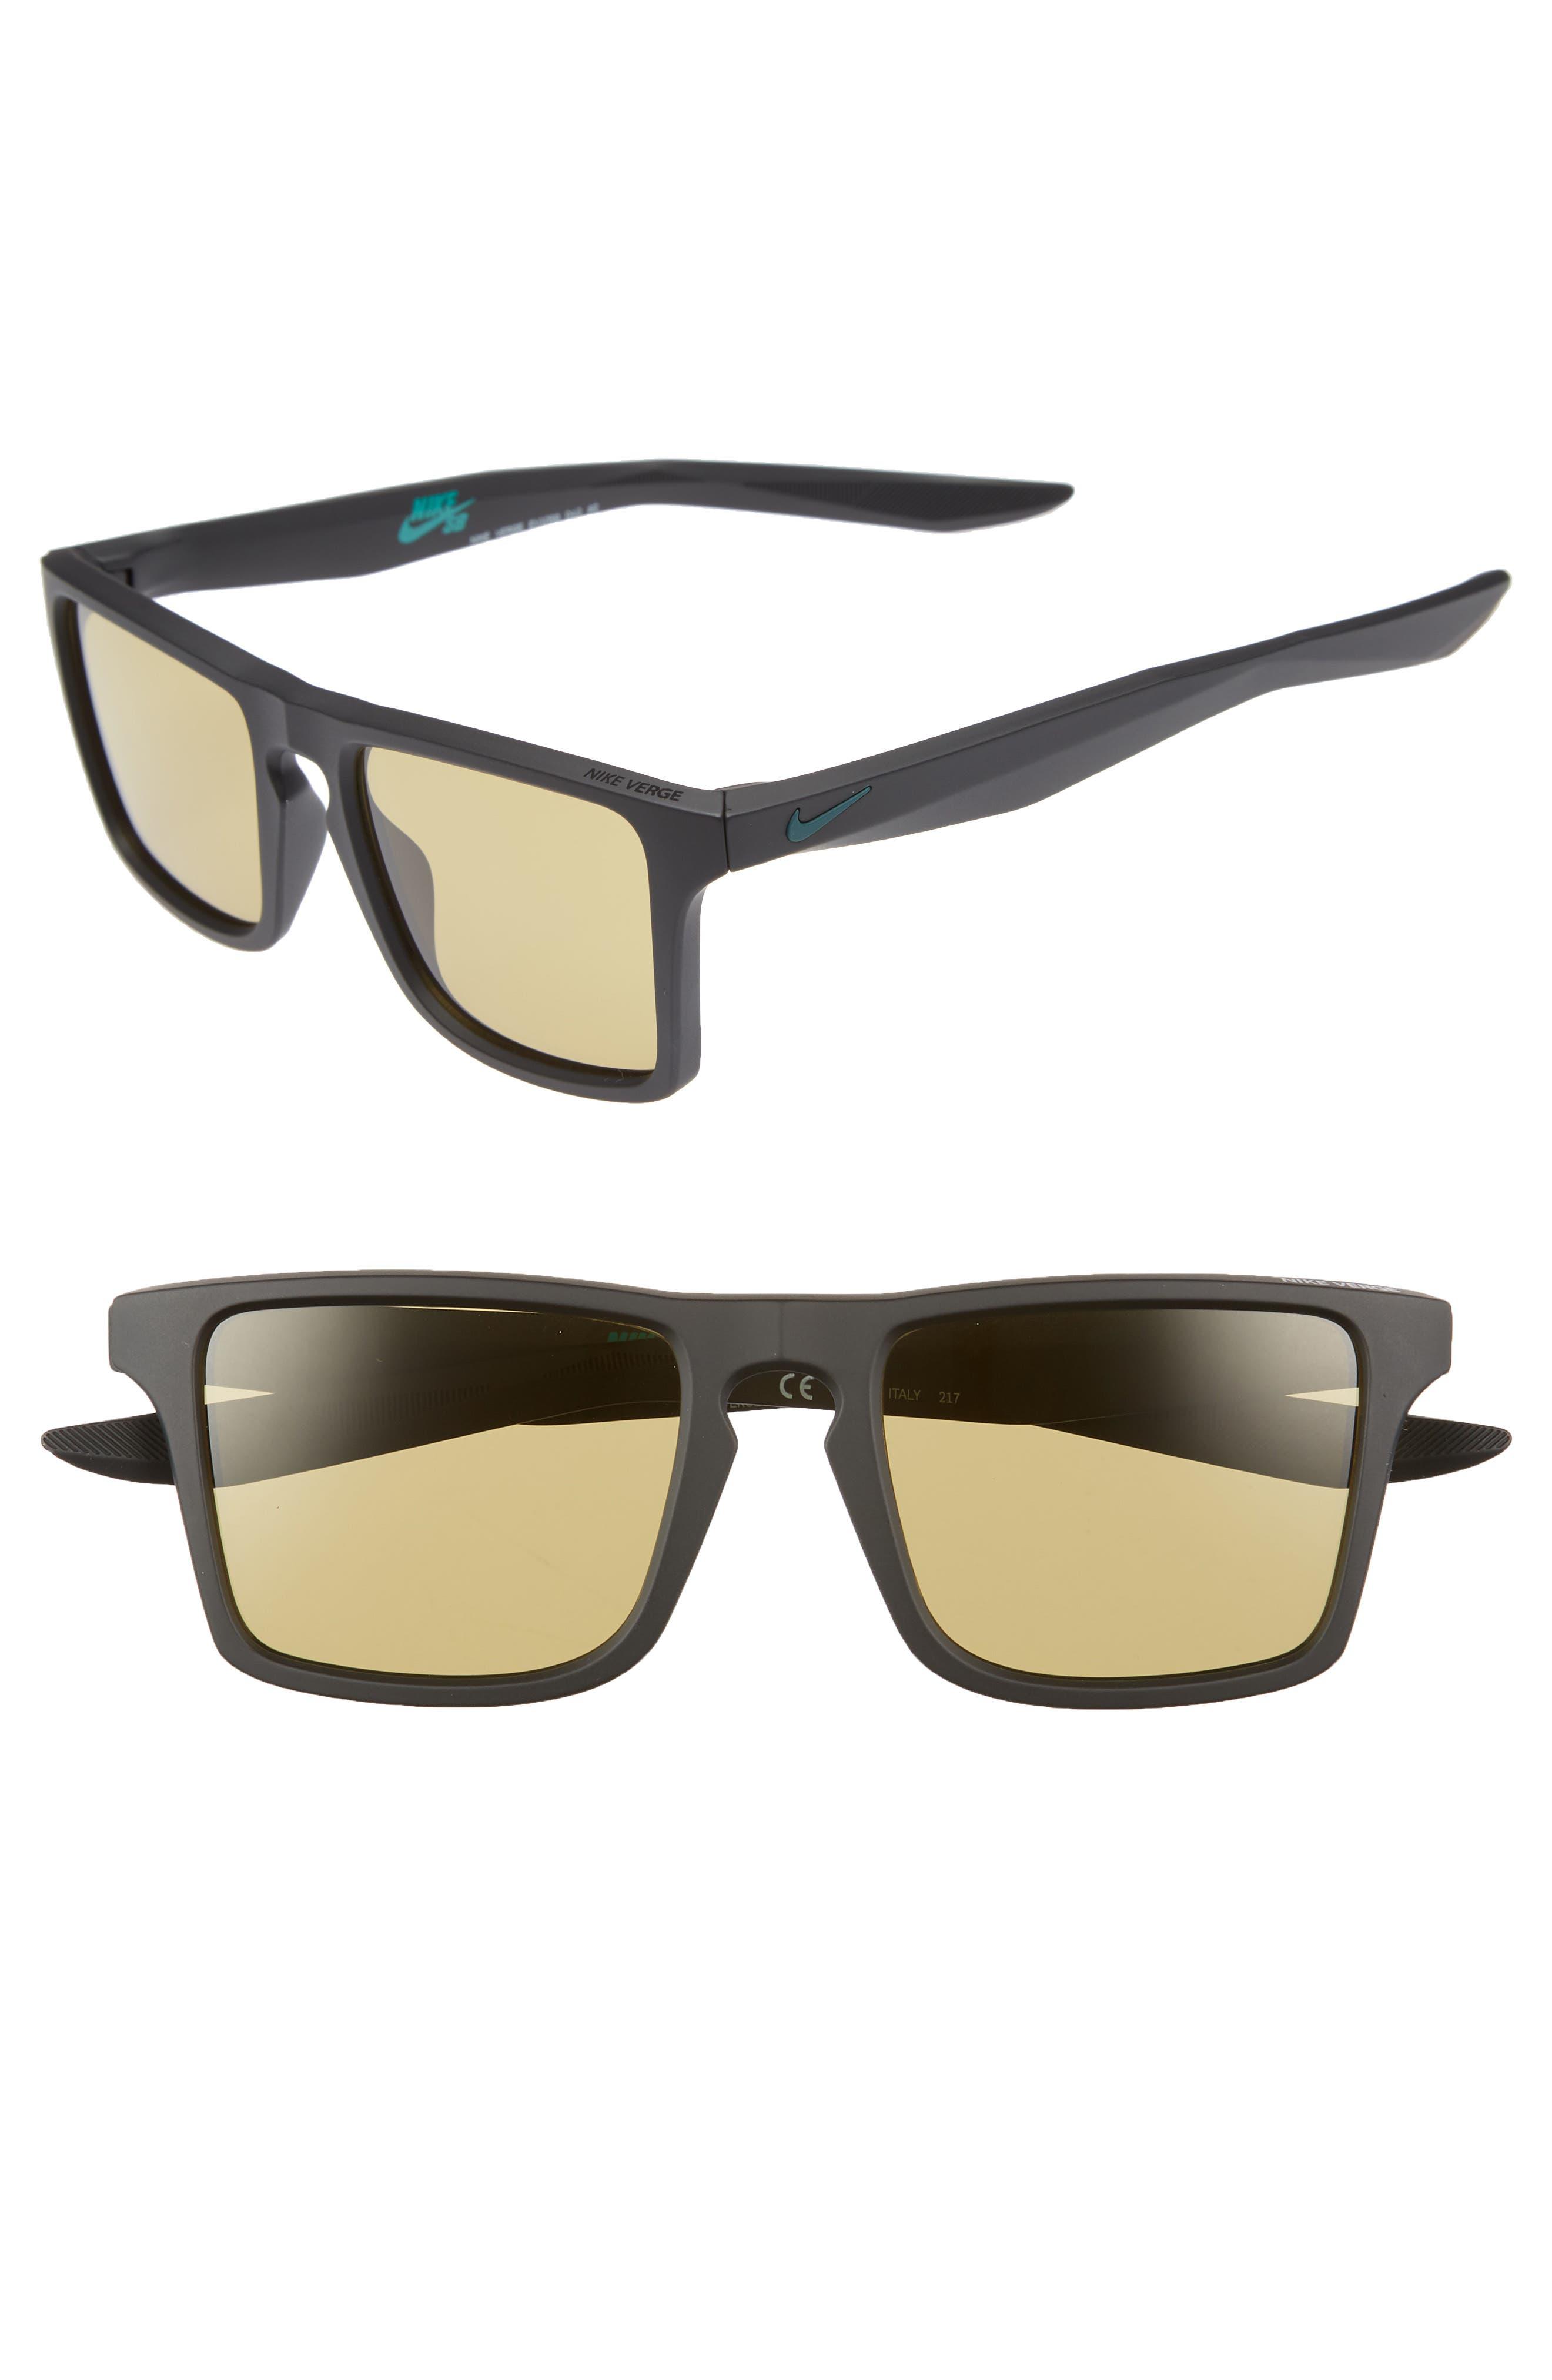 Nike Verge 52Mm Sunglasses - Matte Black/ Amber